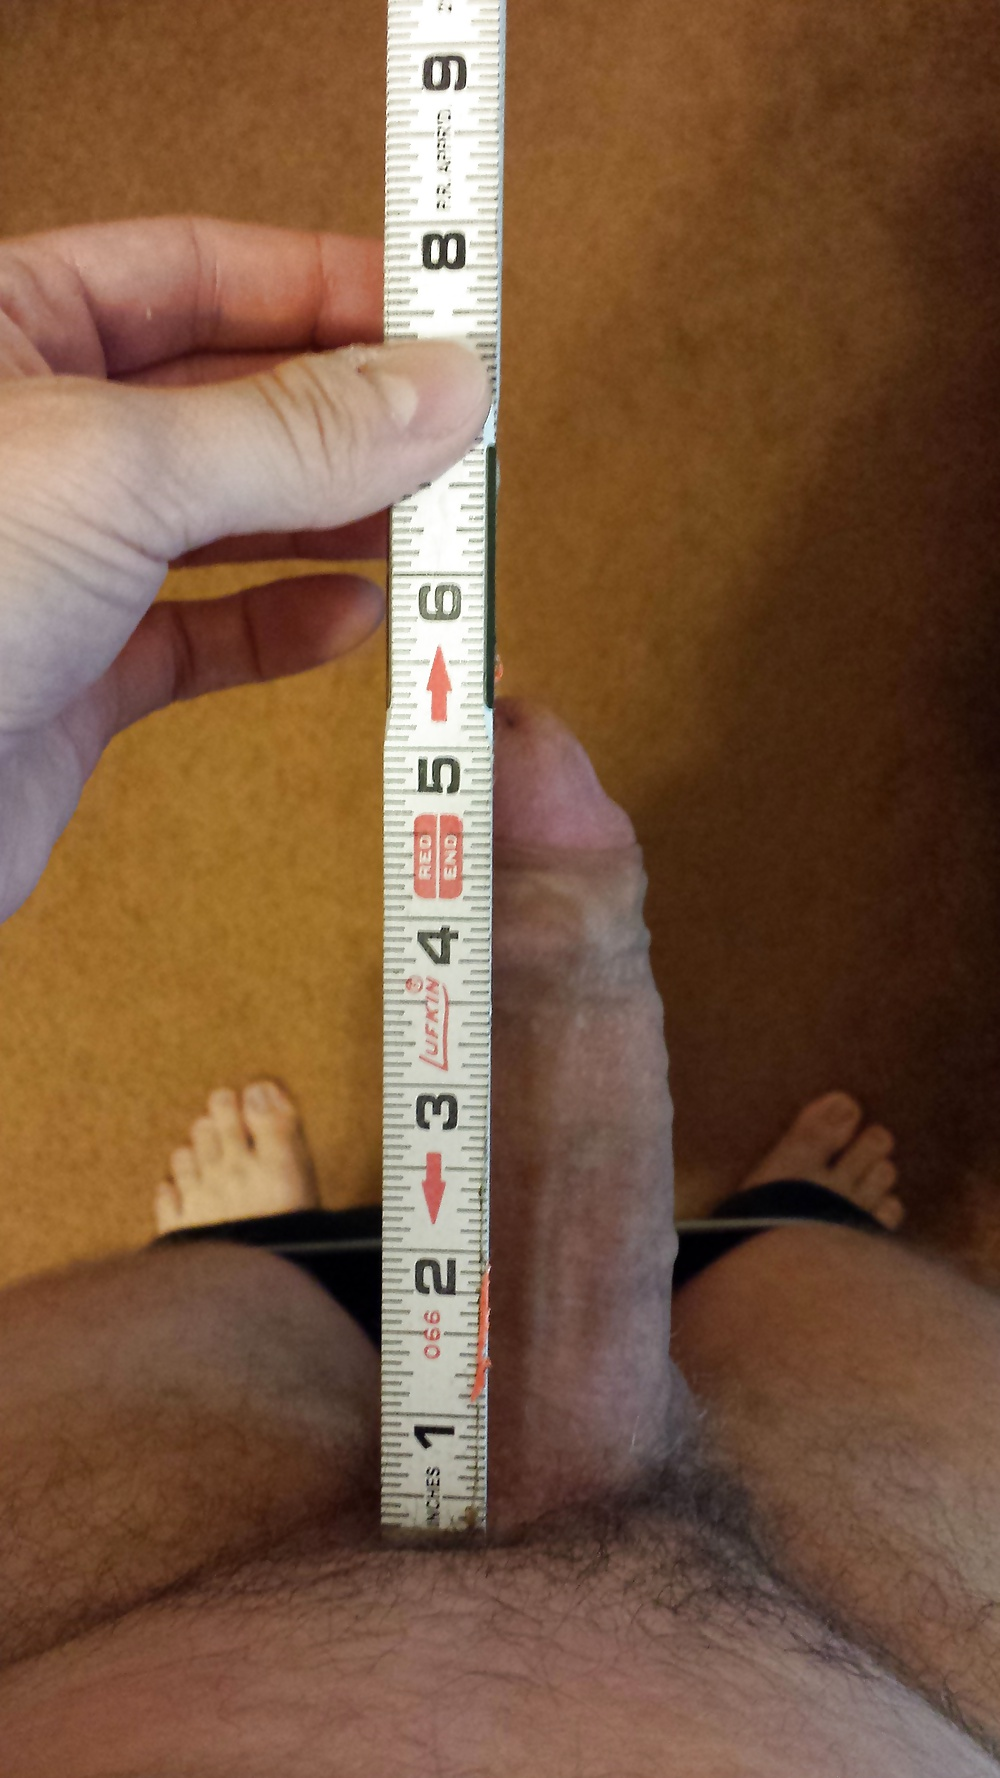 How To Determine Condom Size